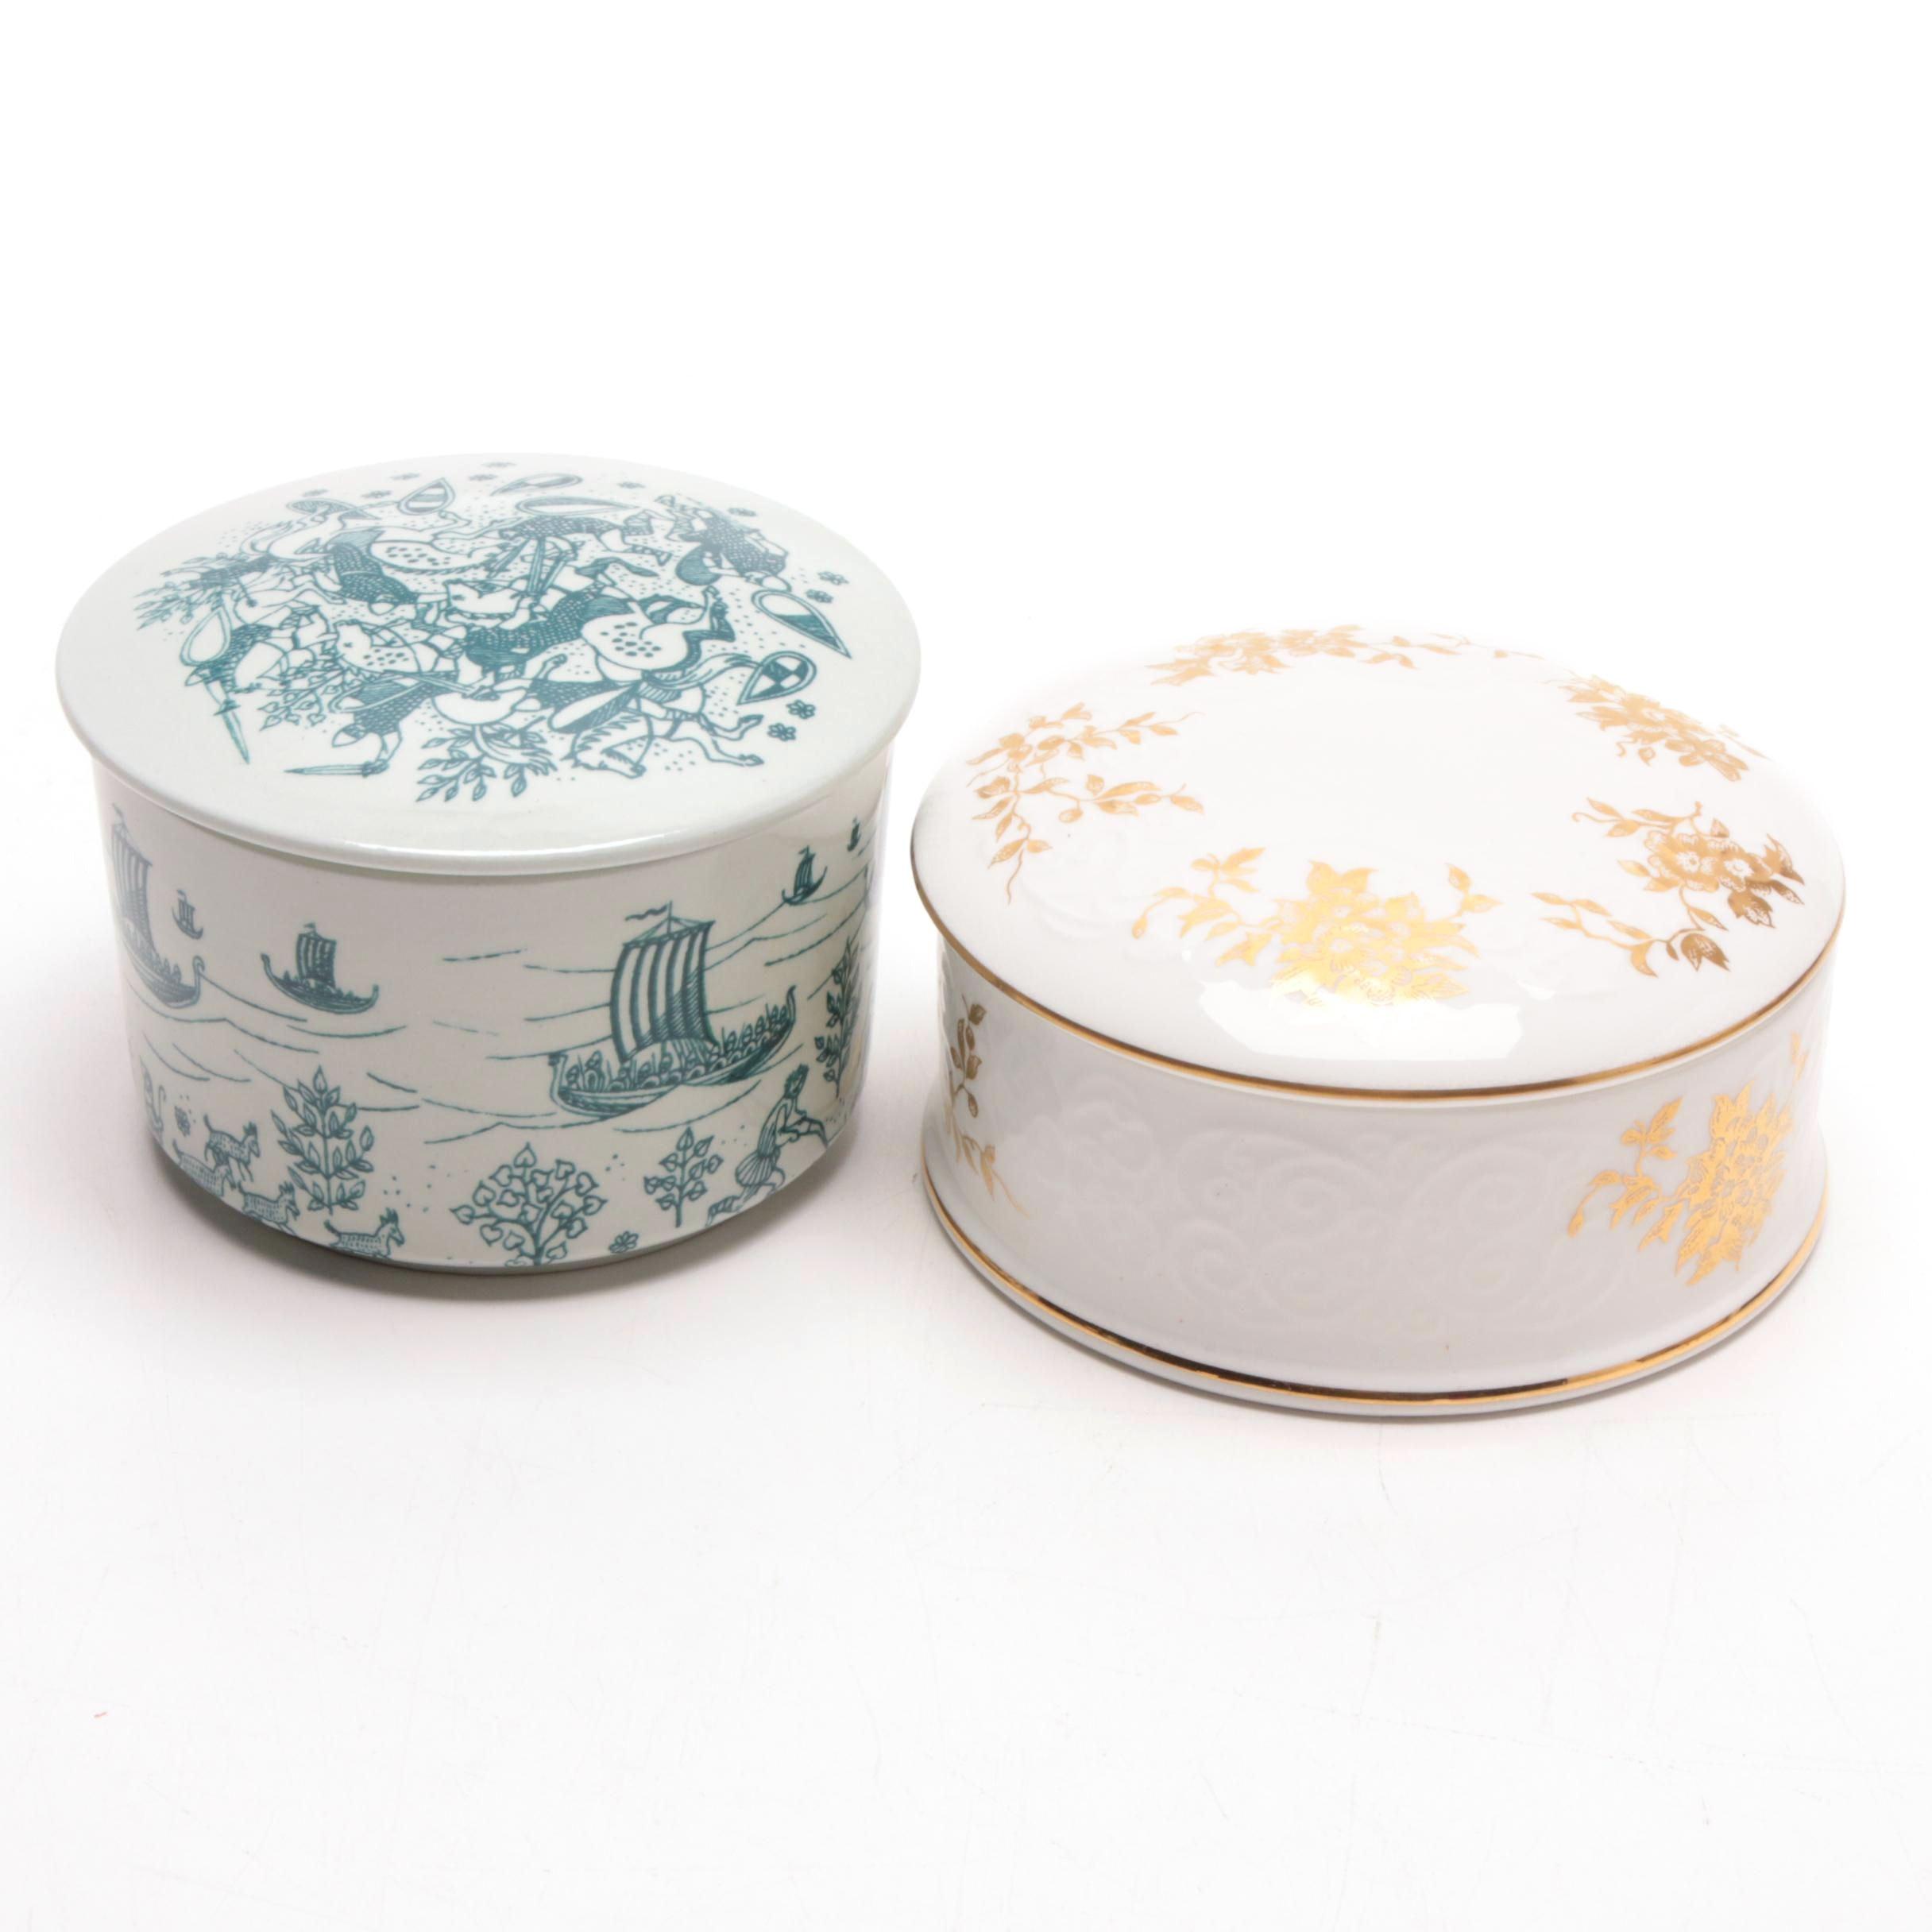 Danish and English Ceramic Vanity Boxes